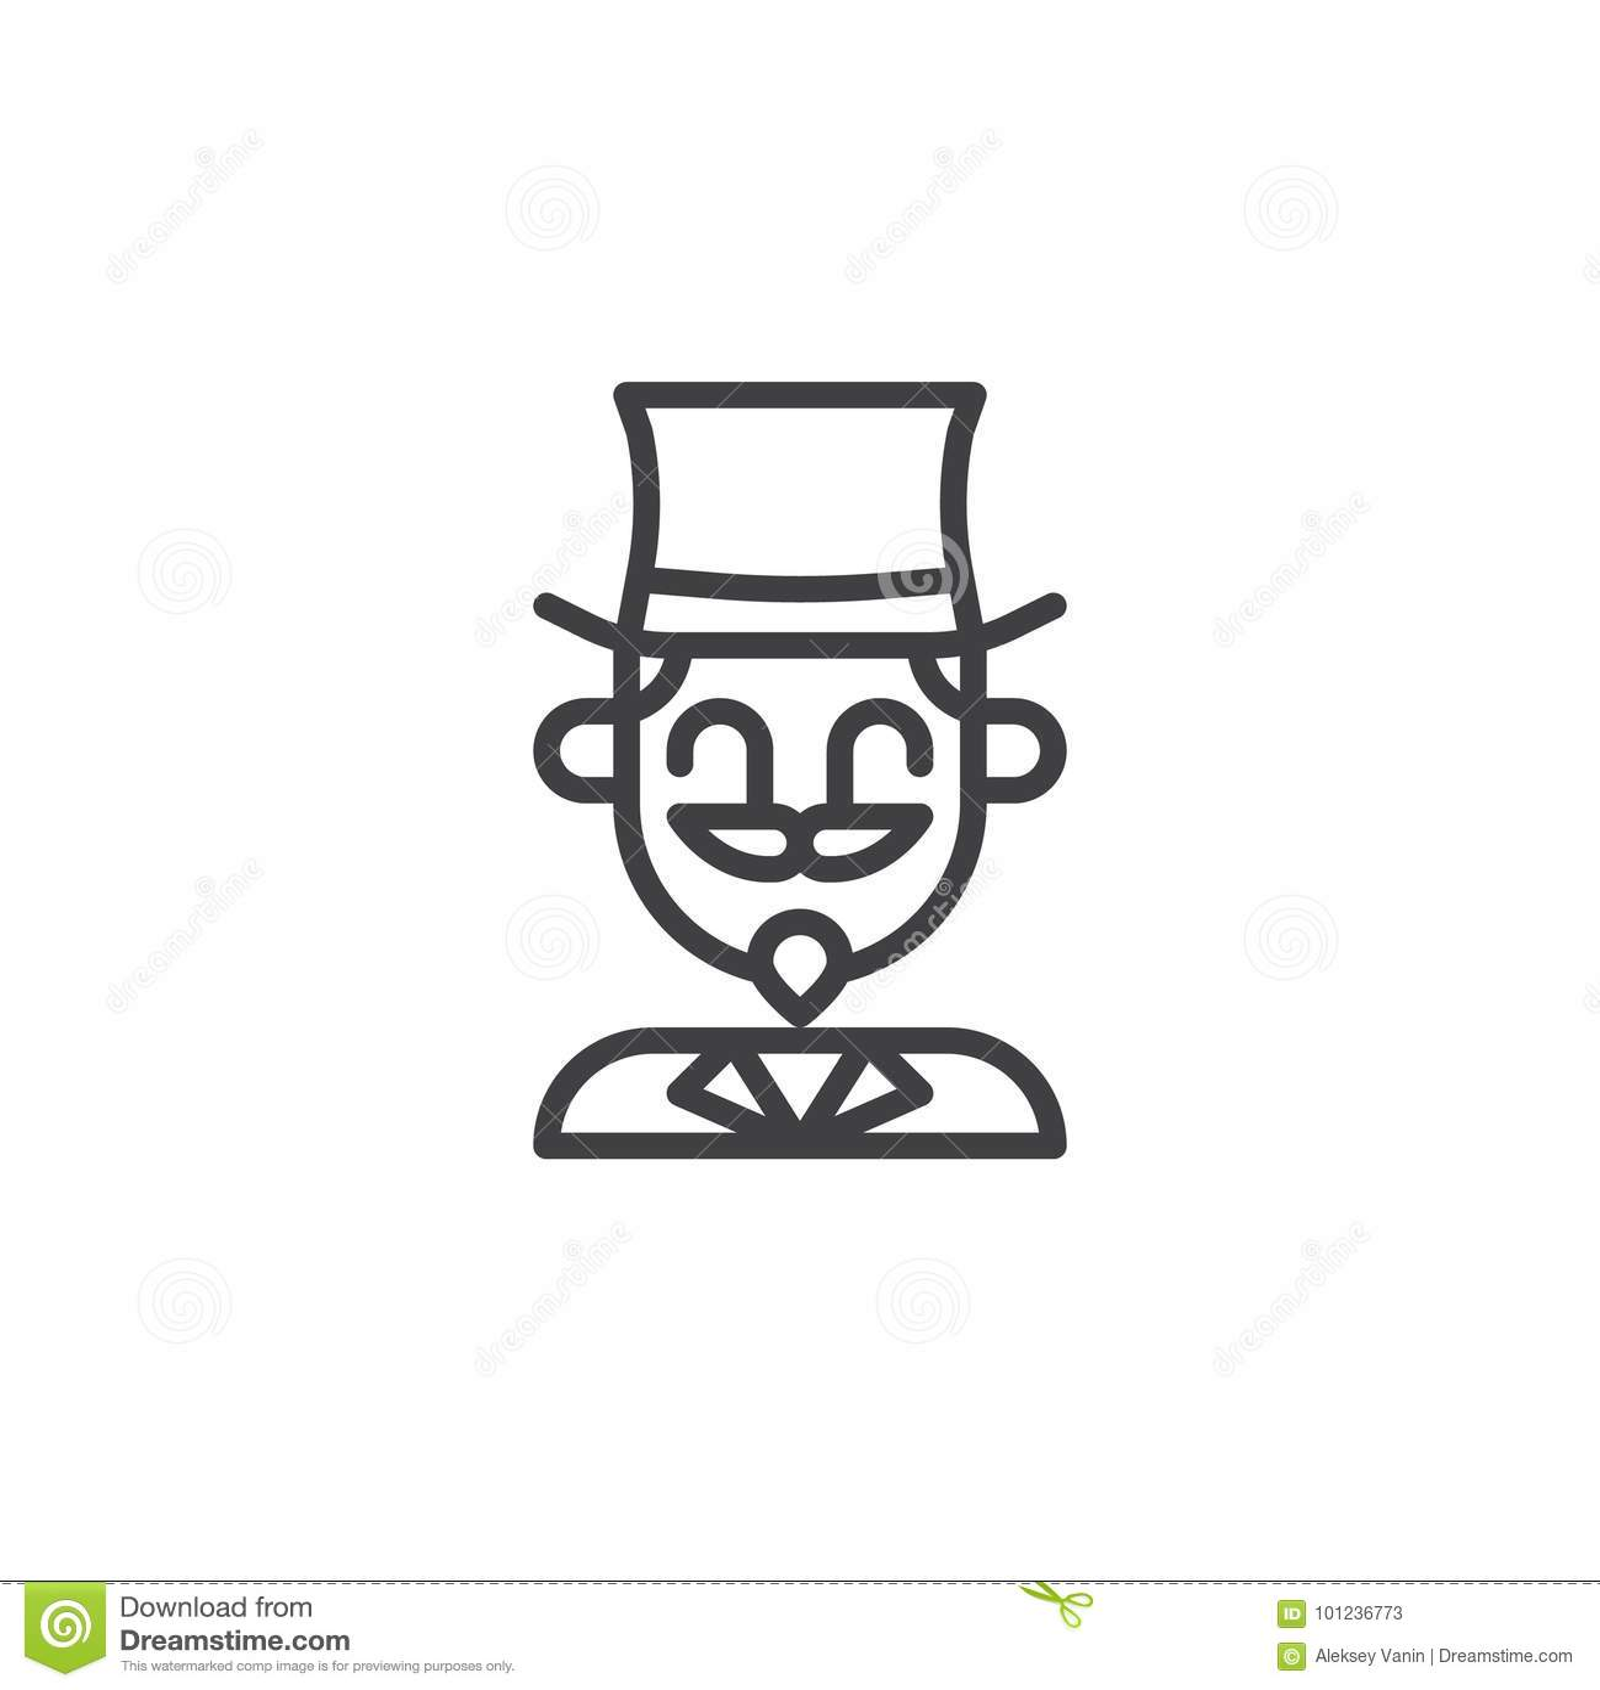 Tremendous Magician Circus Actor Line Icon Stock Vector Illustration Download Free Architecture Designs Licukmadebymaigaardcom